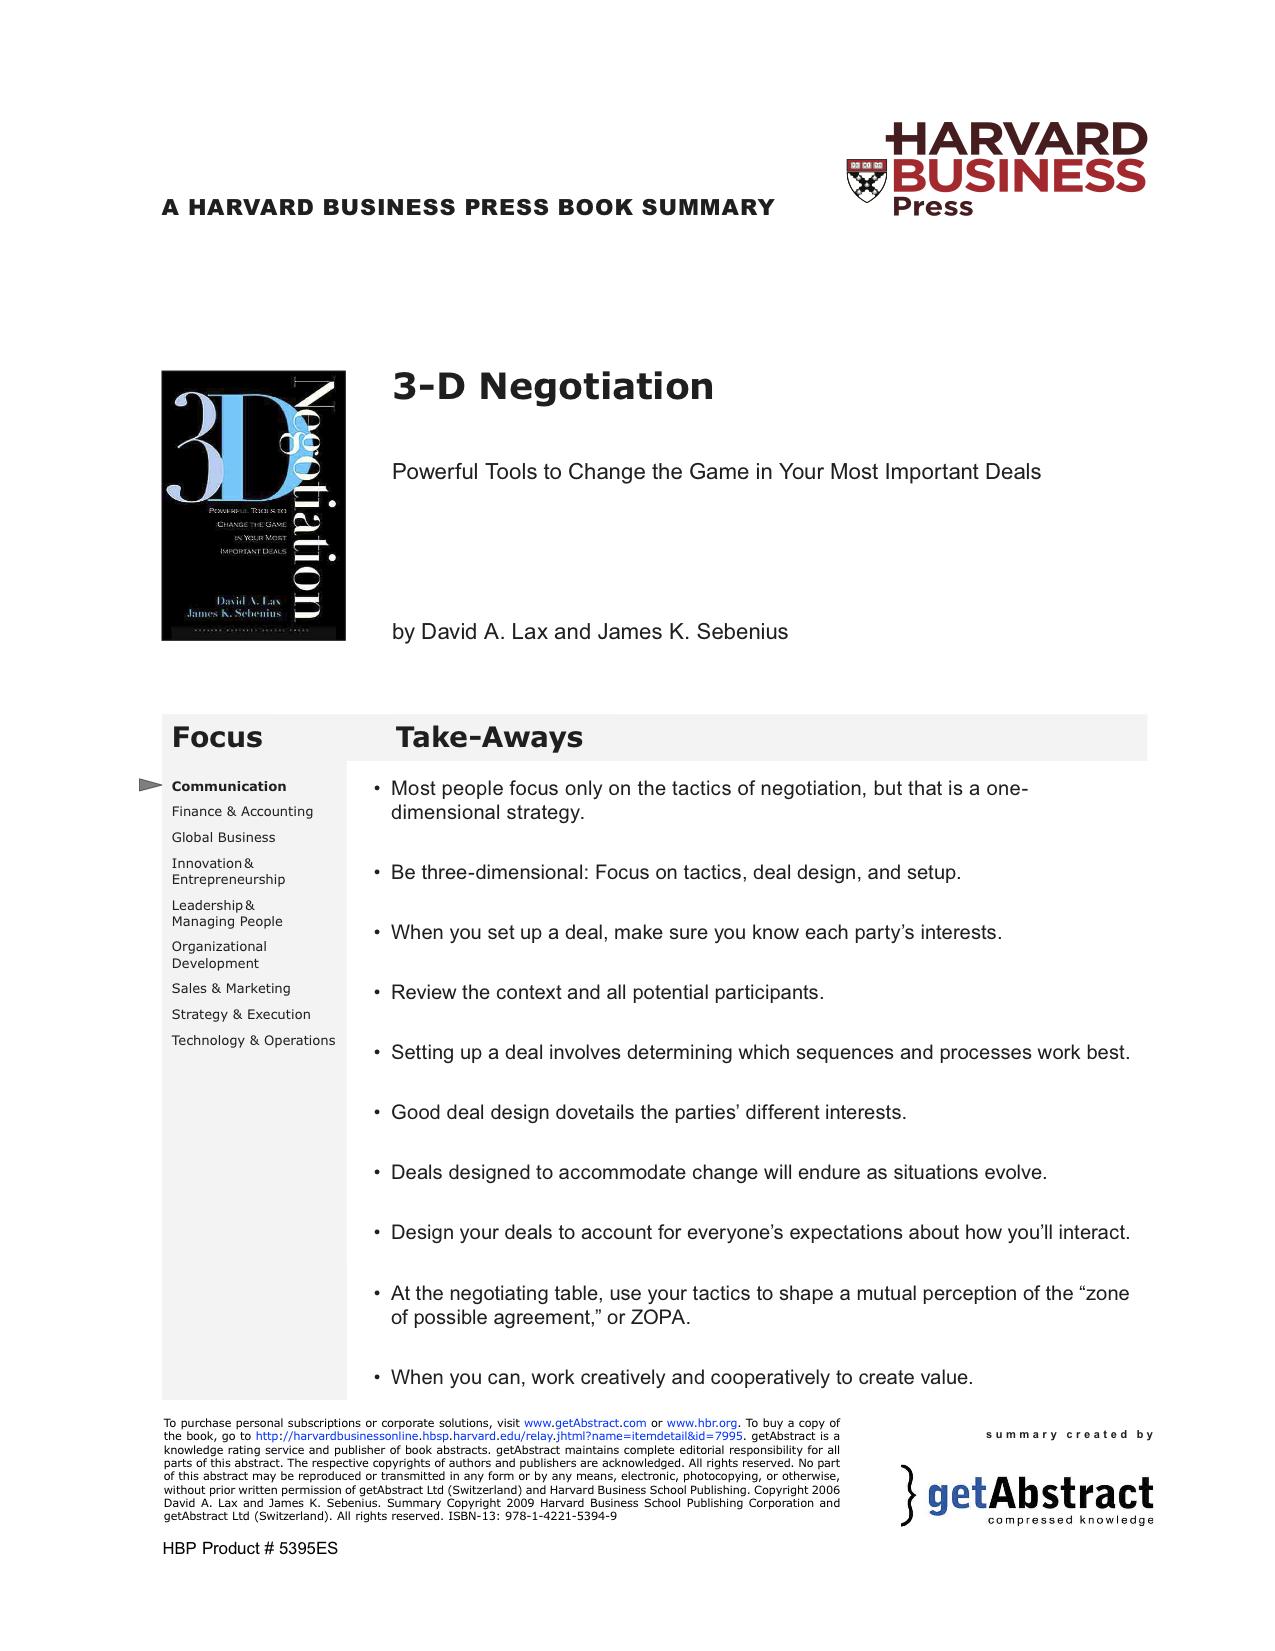 Lax-3DNegotiation